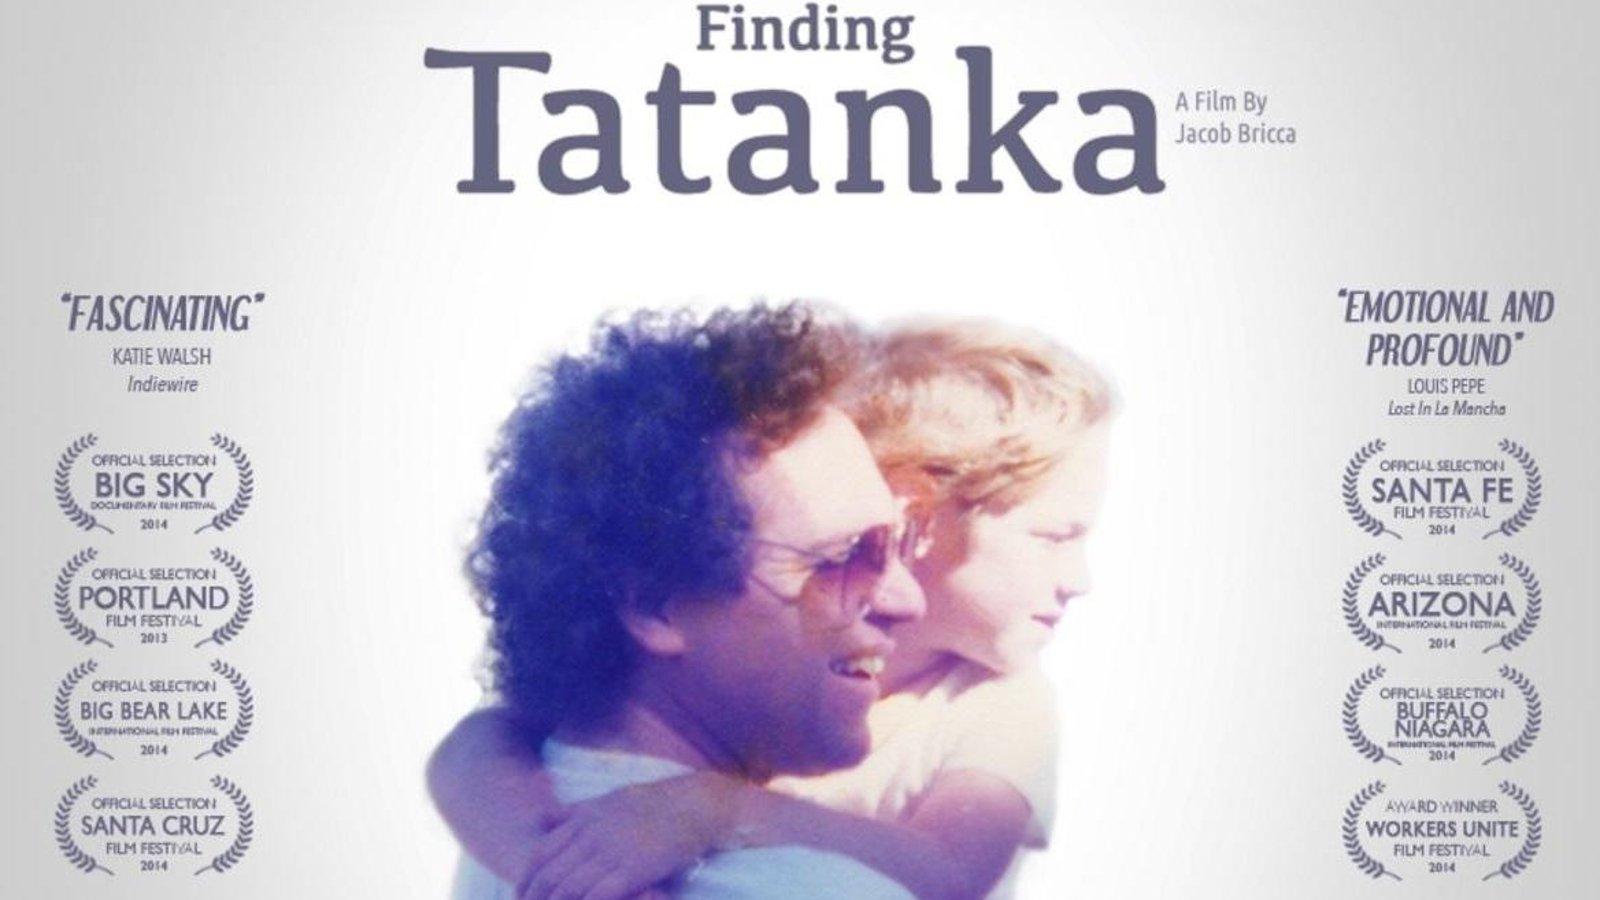 Finding Tatanka - A Bay Area Activist and His Family